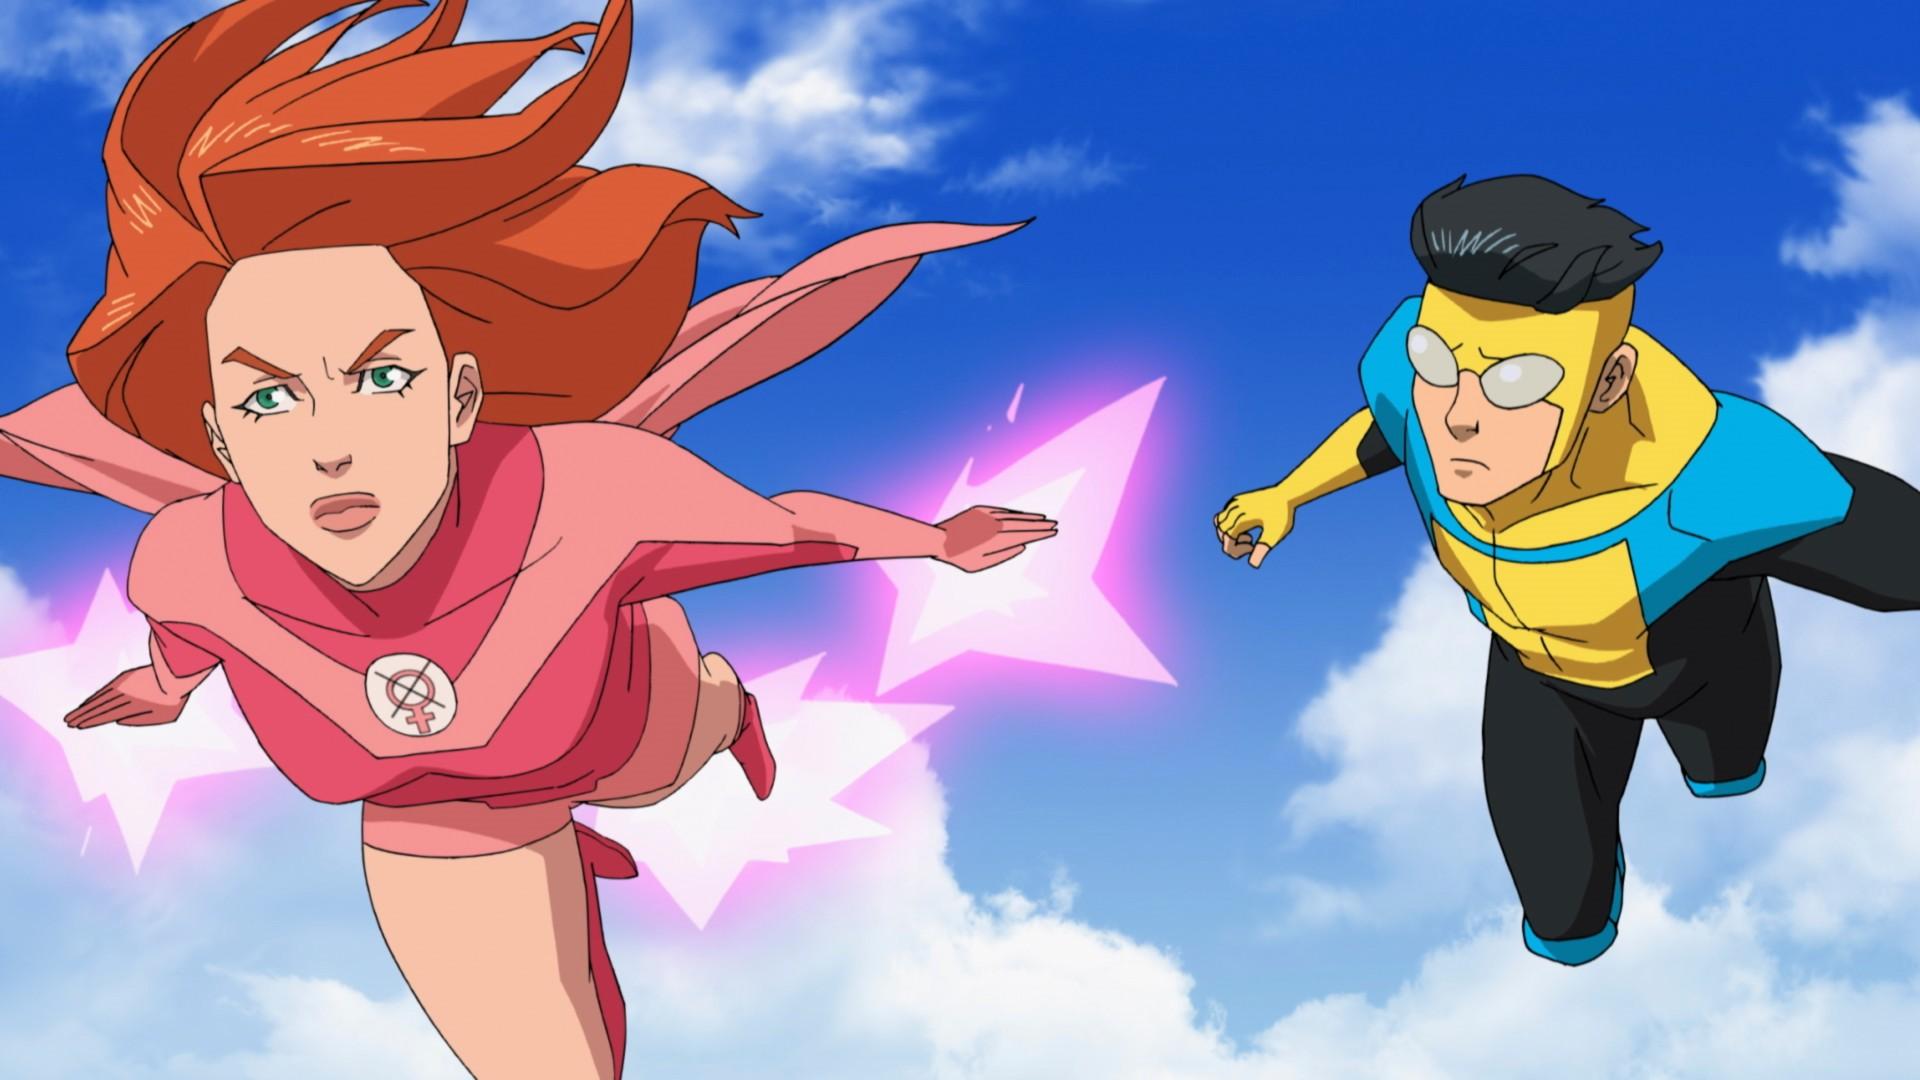 Amazon Studios renew Robert Kirkman adult superhero animation Invincible for two more seasons